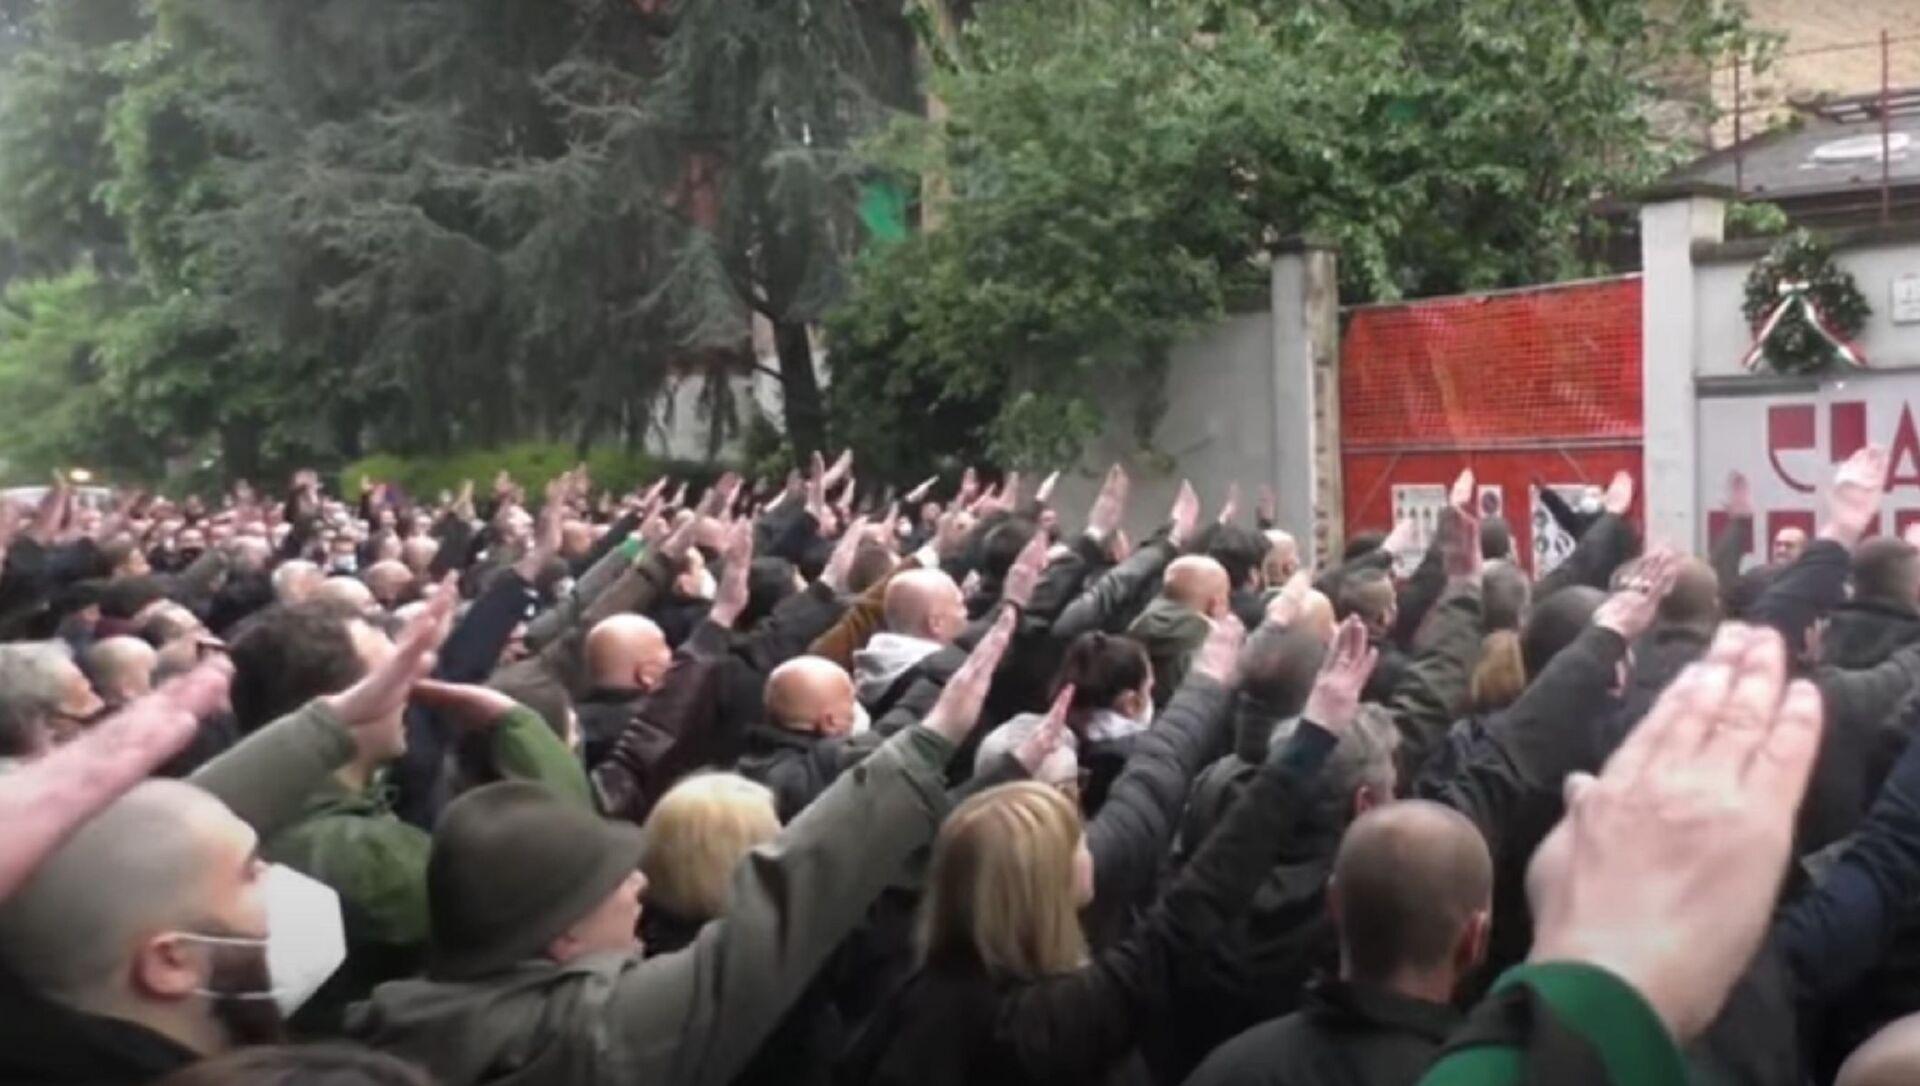 L'estrema destra ricorda Sergio Ramelli - Sputnik Italia, 1920, 30.04.2021